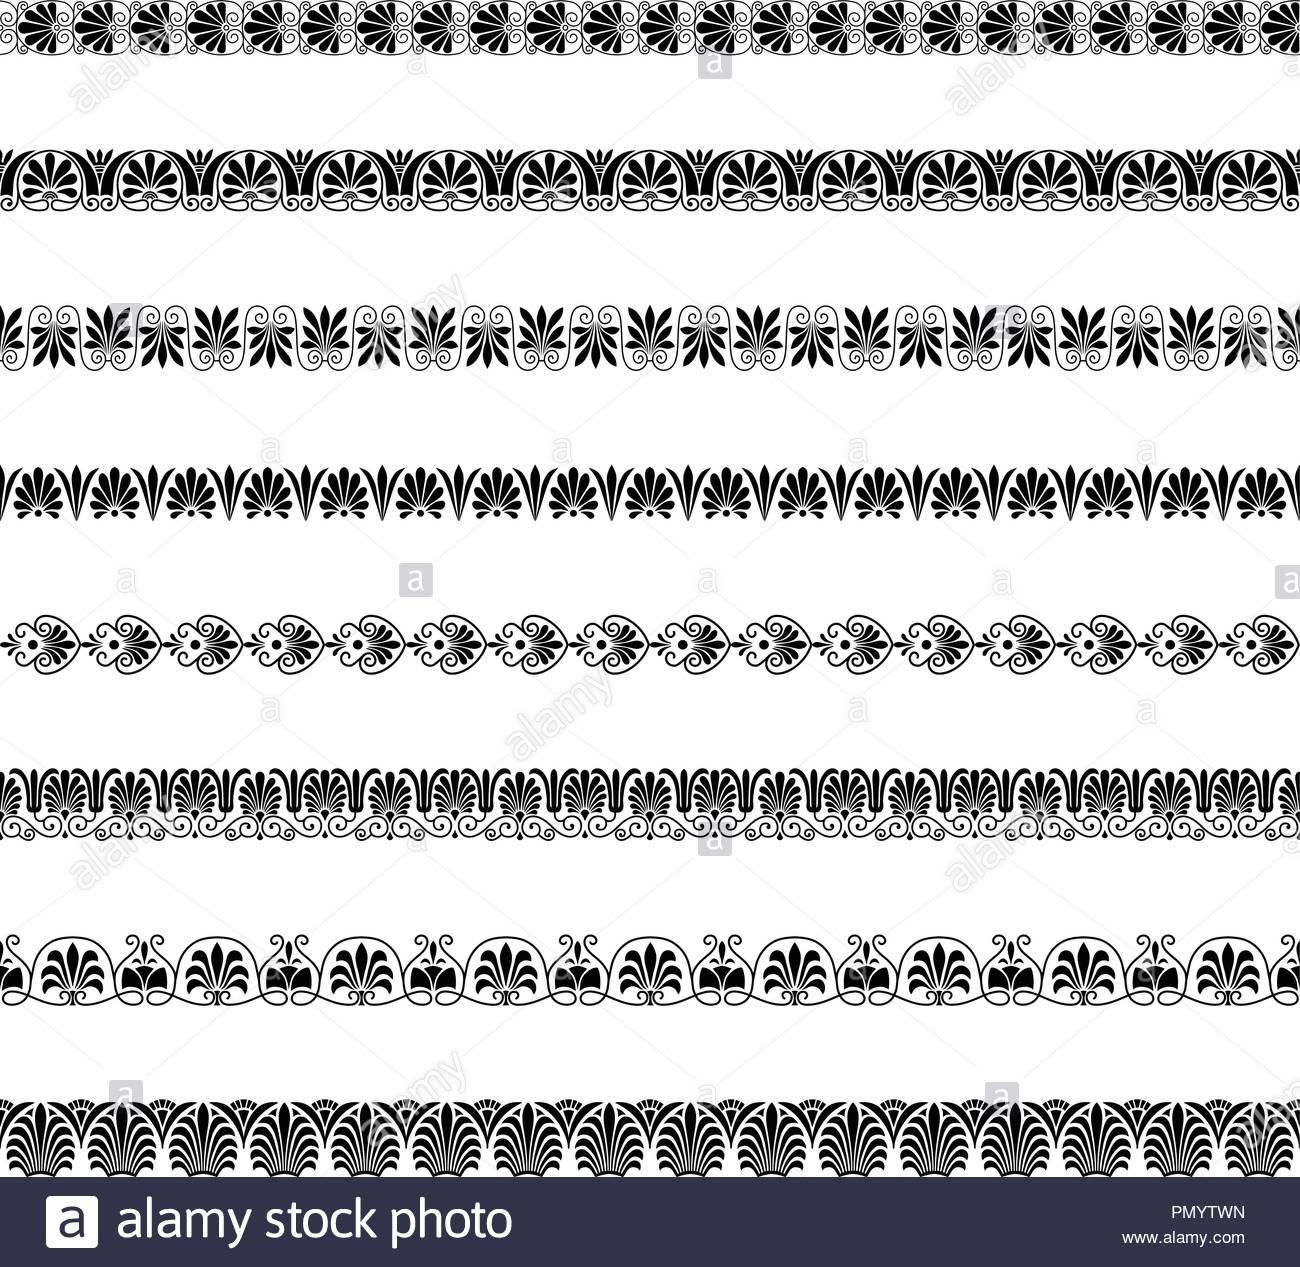 greek ornamental border patterns